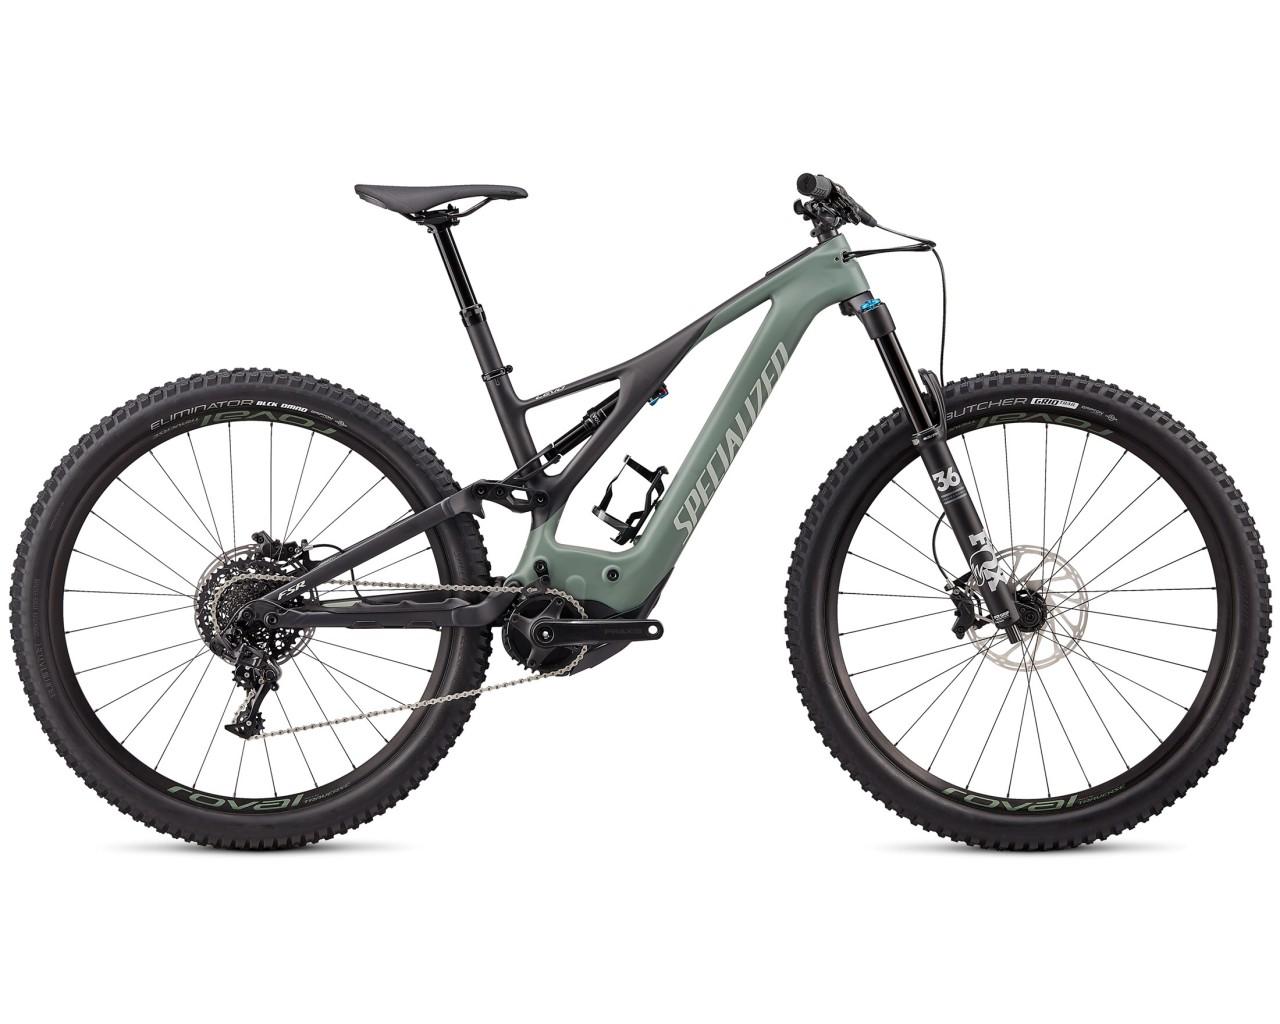 Specialized Levo Expert Carbon 29 - Elektro MTB Fully 2020 | spruce-sage green